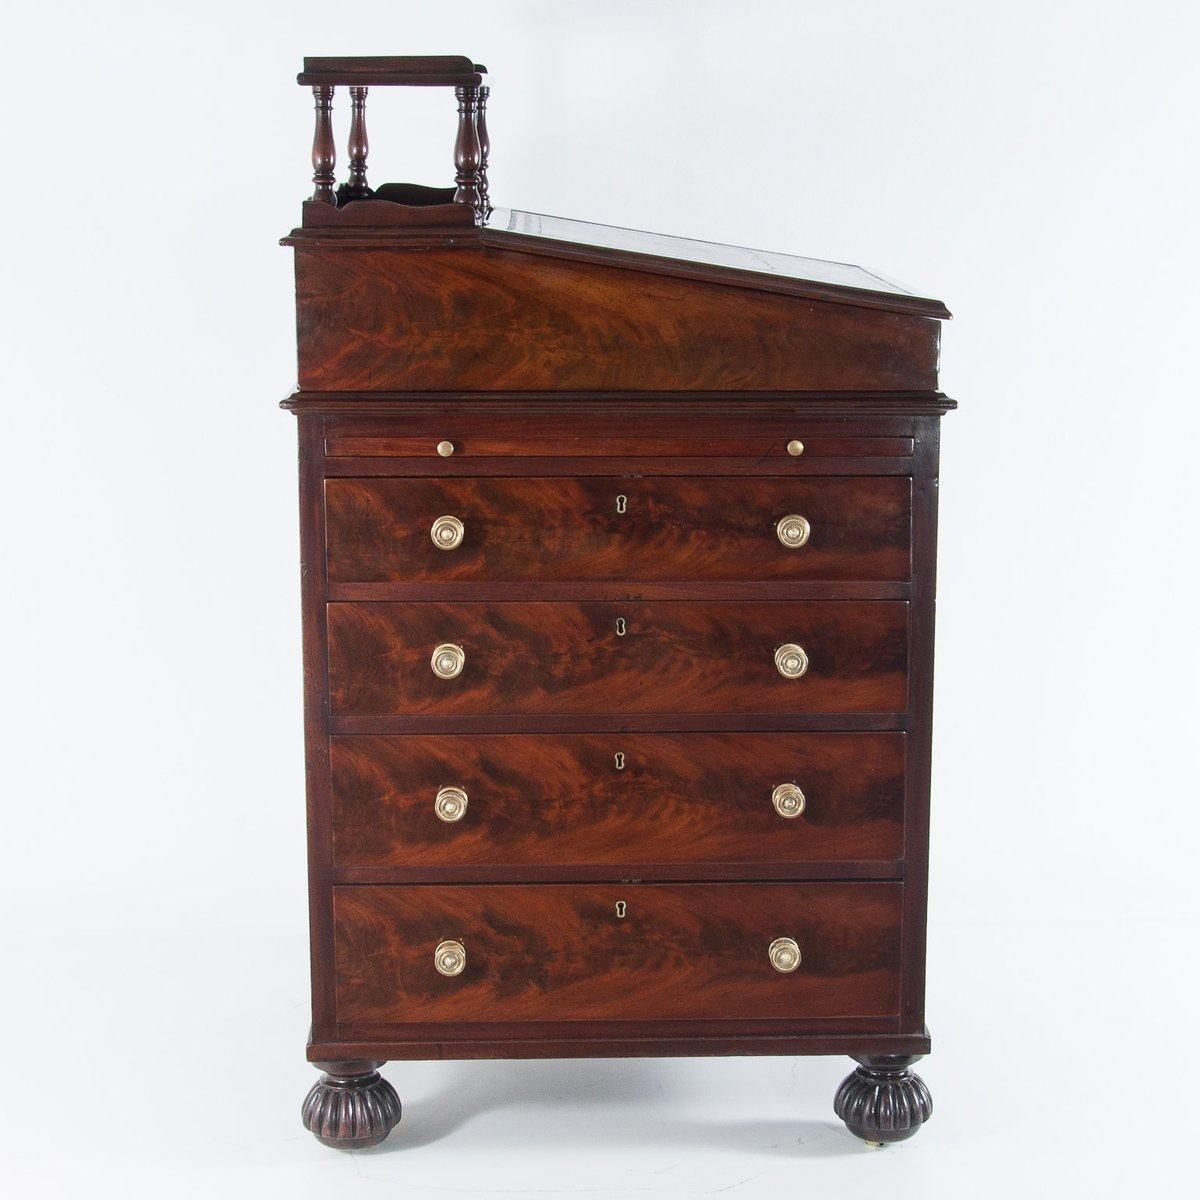 Antique English Late Regency Period Davenport Mahogany Desk - Antique English Late Regency Period Davenport Mahogany Desk For Sale